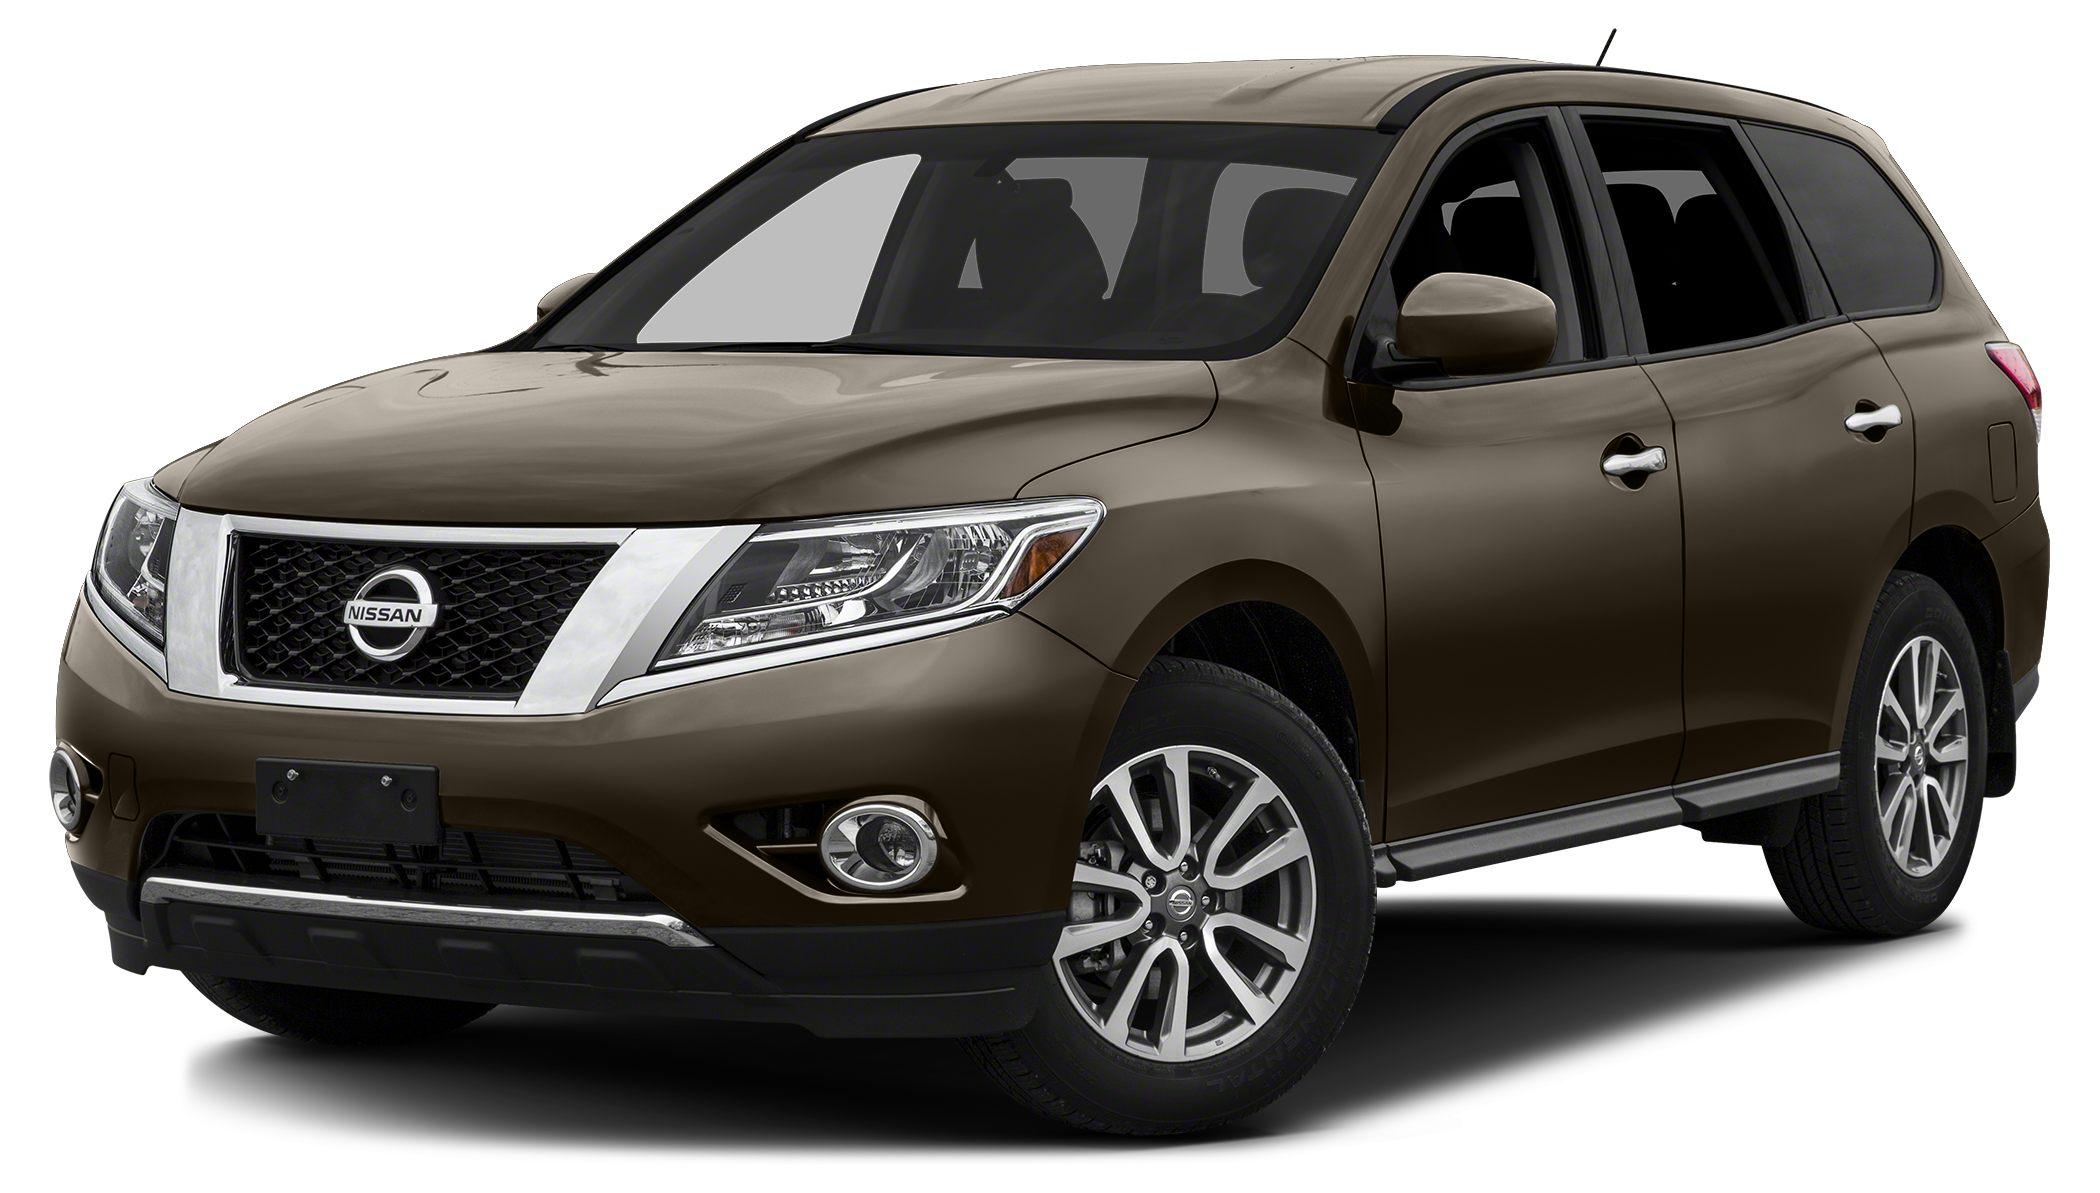 2015 Nissan Pathfinder  Miles 20778Color Brown Stock P642 VIN 5N1AR2MN7FC611500